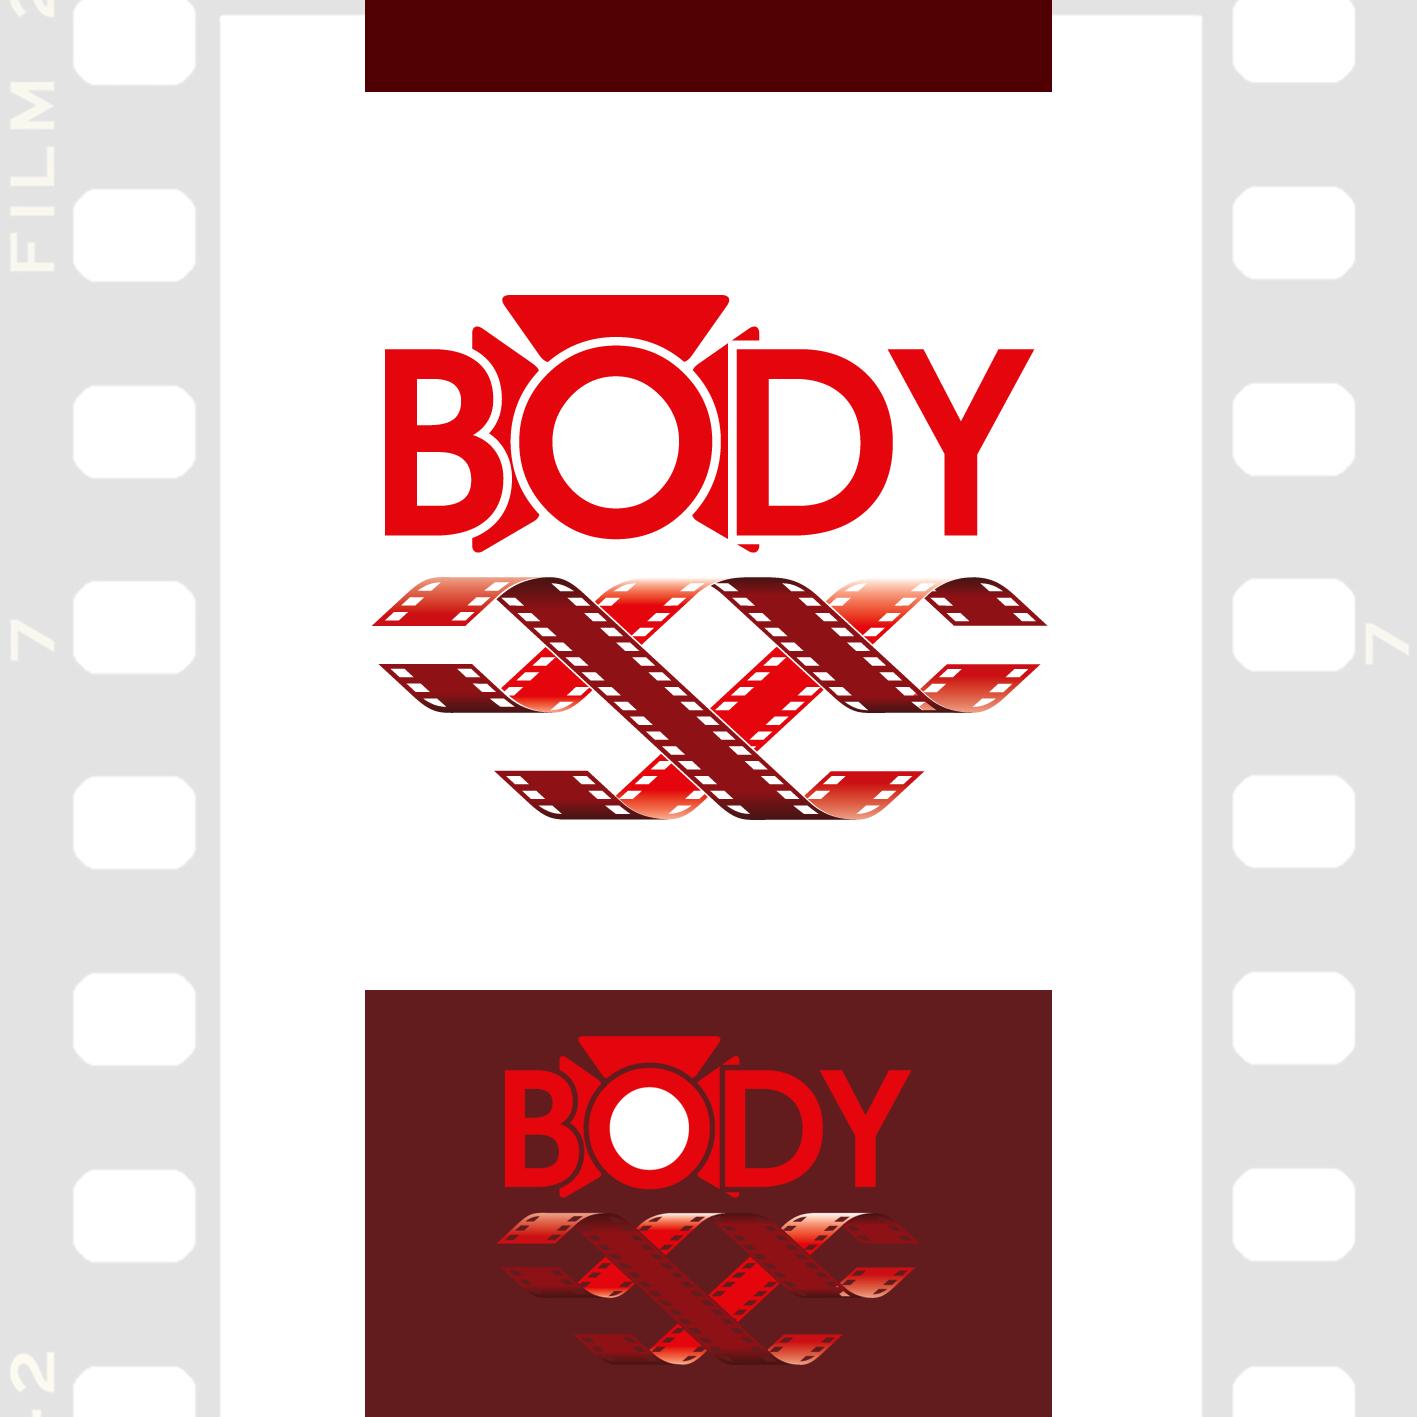 Разработка логотипа (видеоблог для моделей) фото f_1555b24da6375397.png